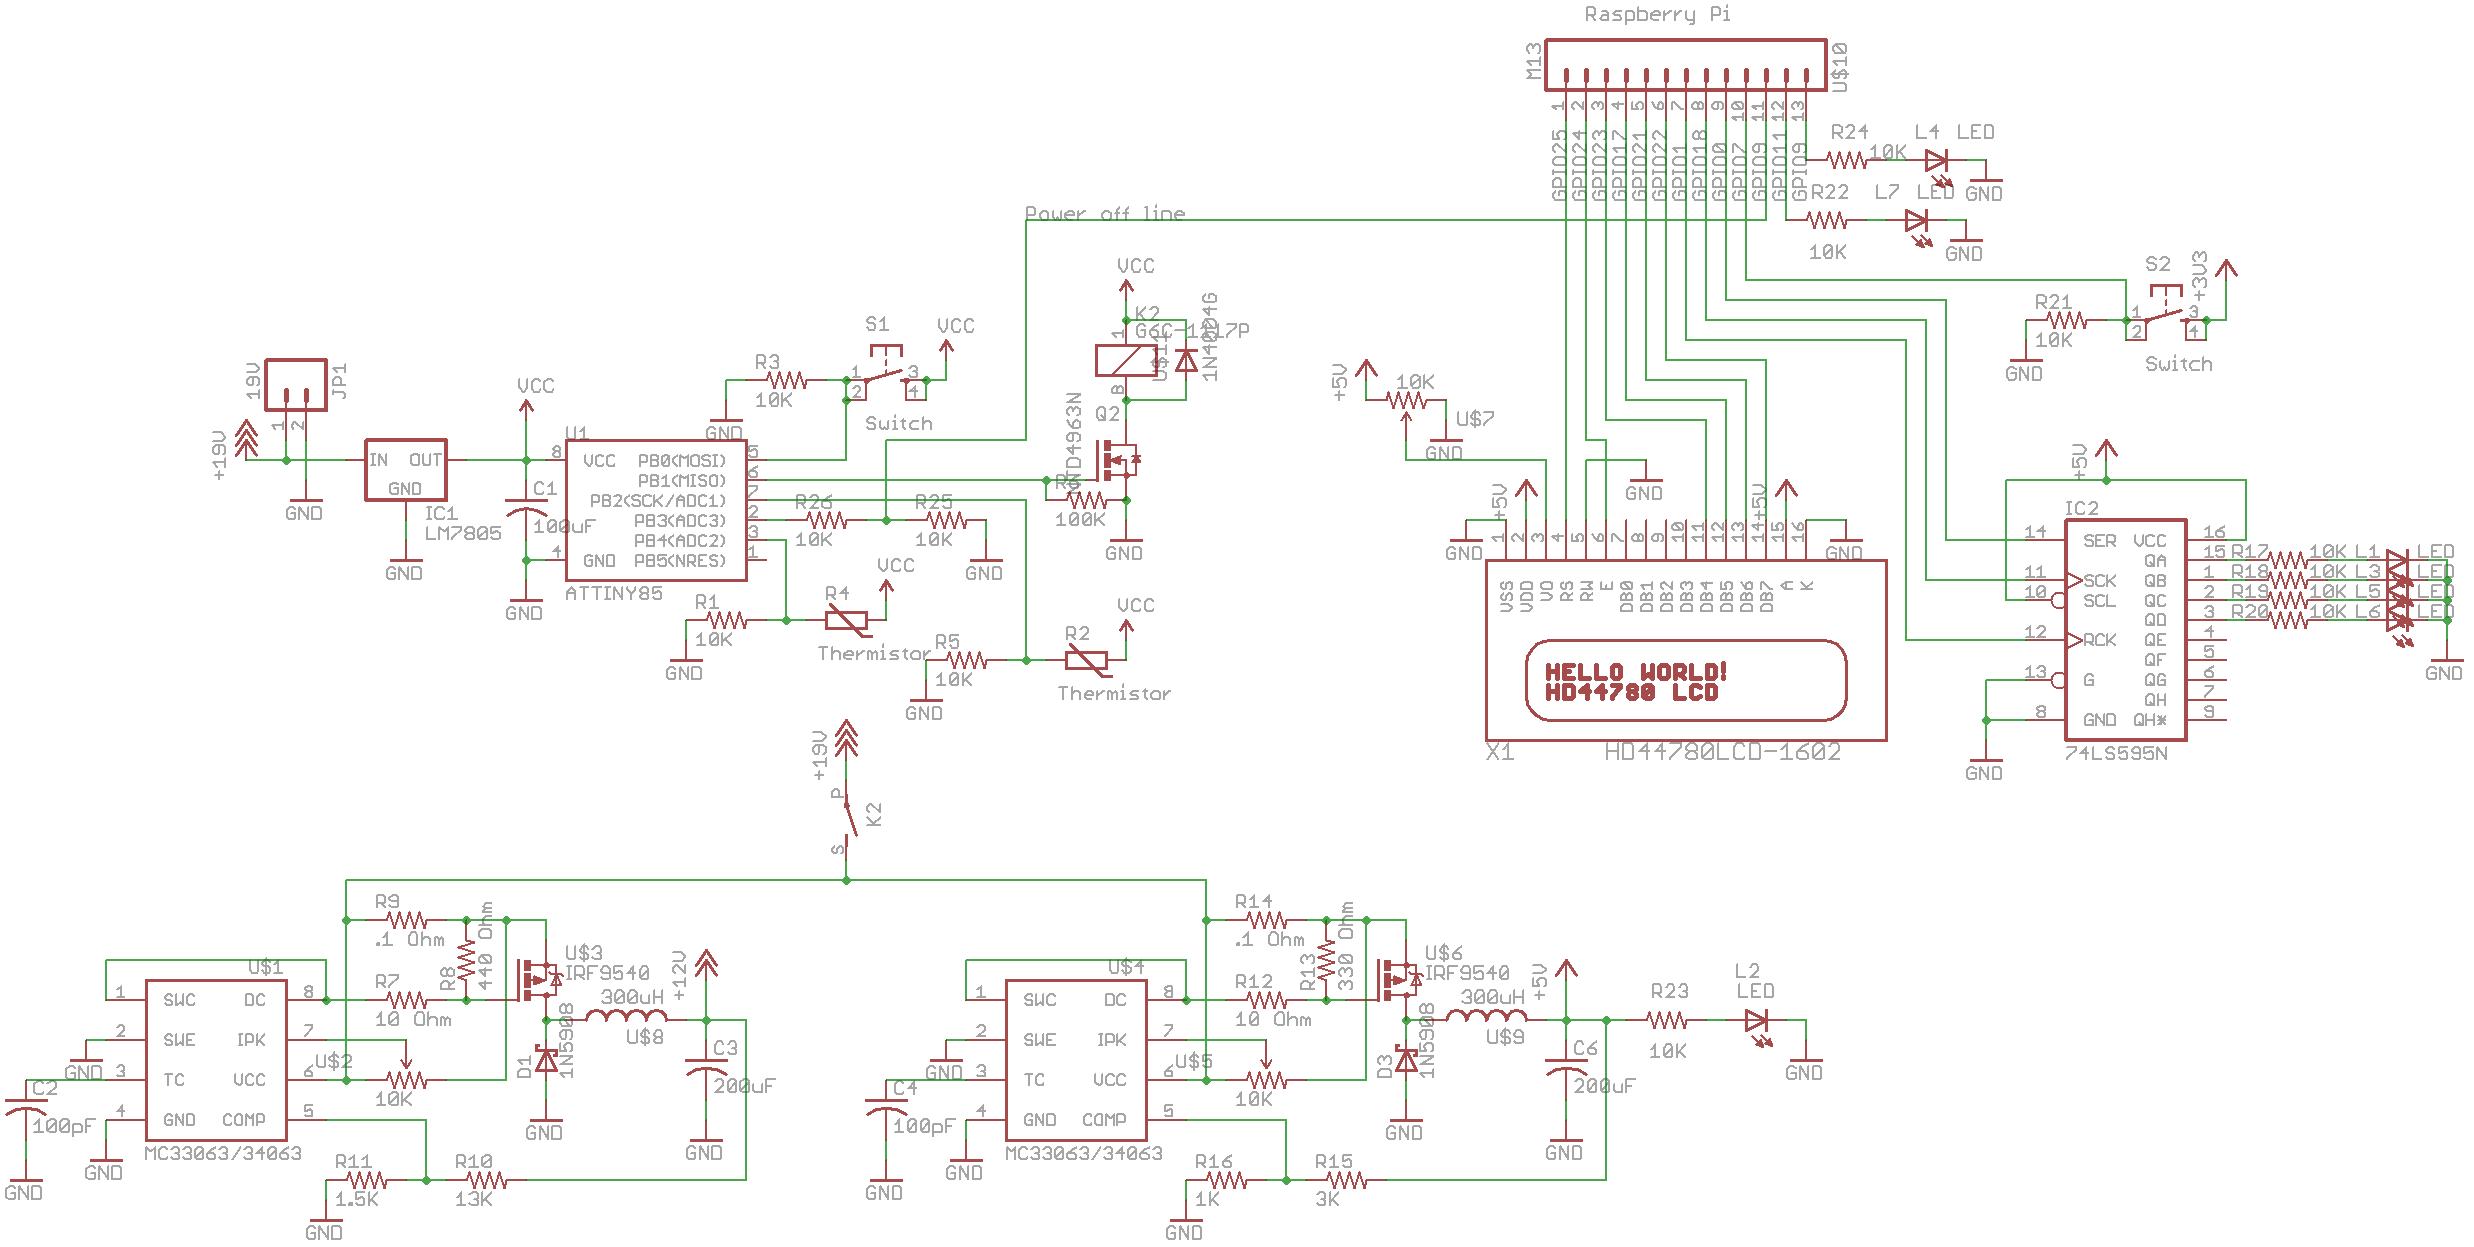 rpi2 2 sata to usb converter circuit diagram the wiring diagram nos wiring diagram at money-cpm.com